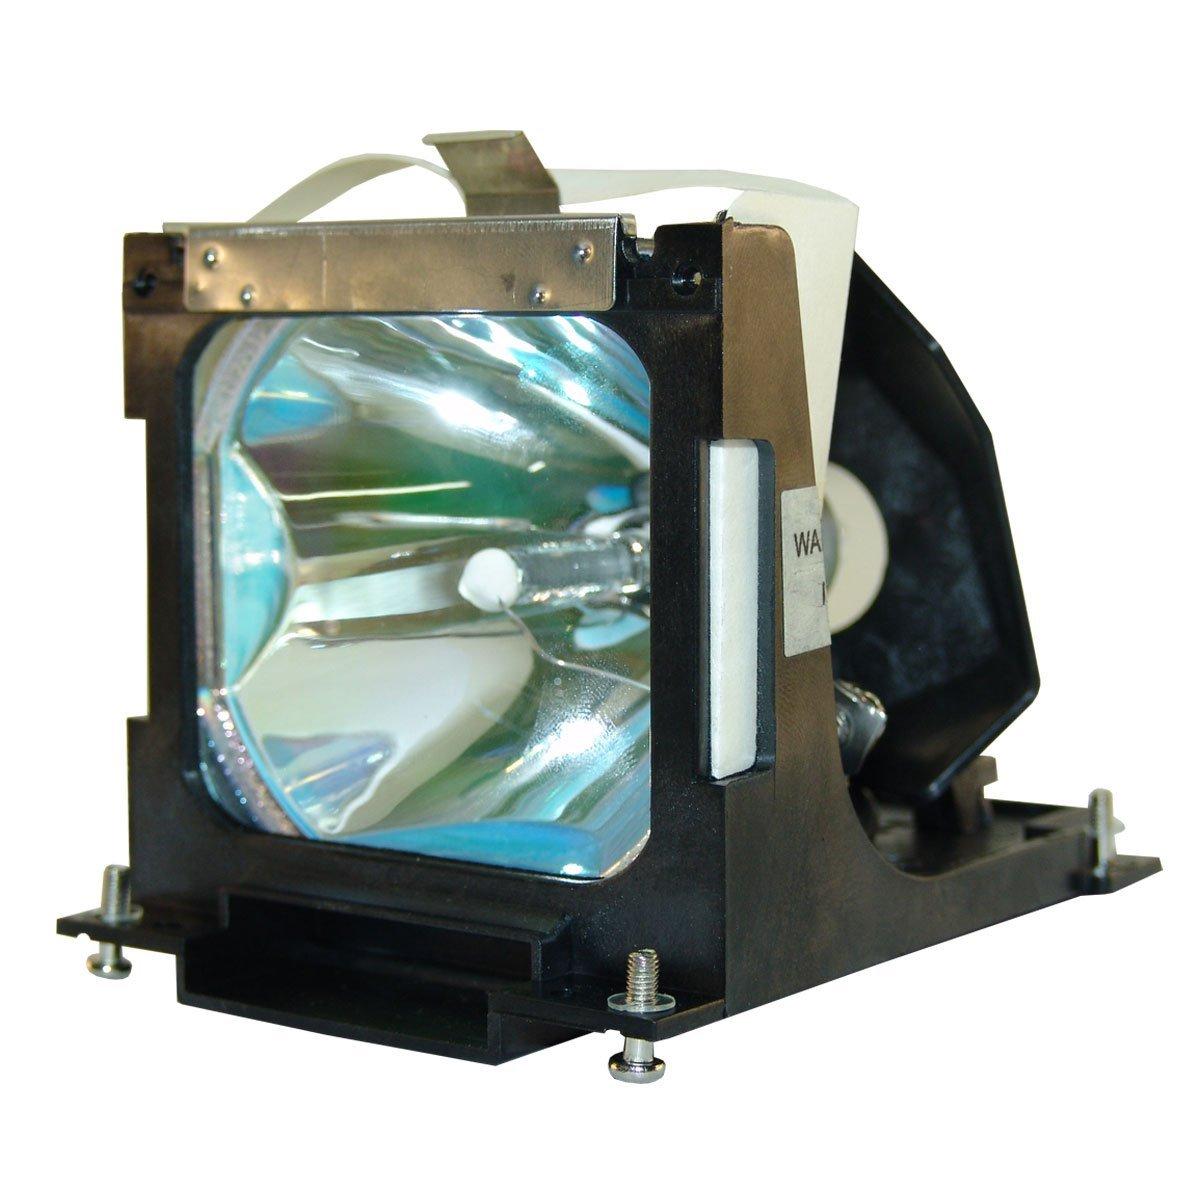 ФОТО POA-LMP63 LMP63 610-304-5214 Lamp for SANYO PLC-XU45 XU45 LC-XNB5M XNB5M Projector Lamp Bulb with housing